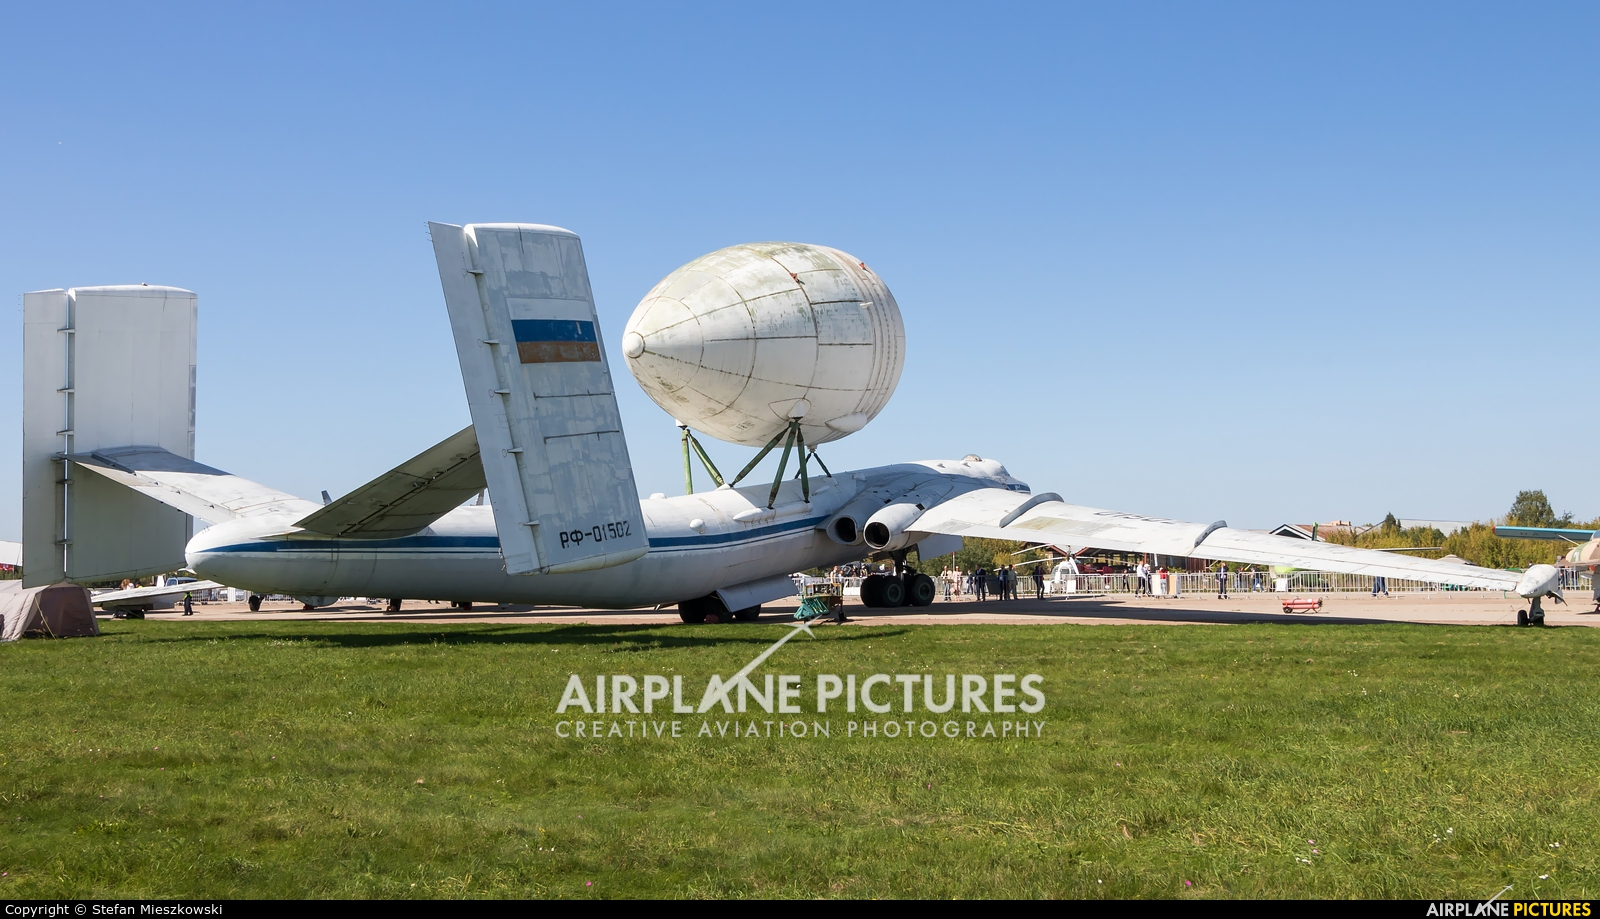 Russia - Air Force RF-01502 aircraft at Zhukovsky International Airport